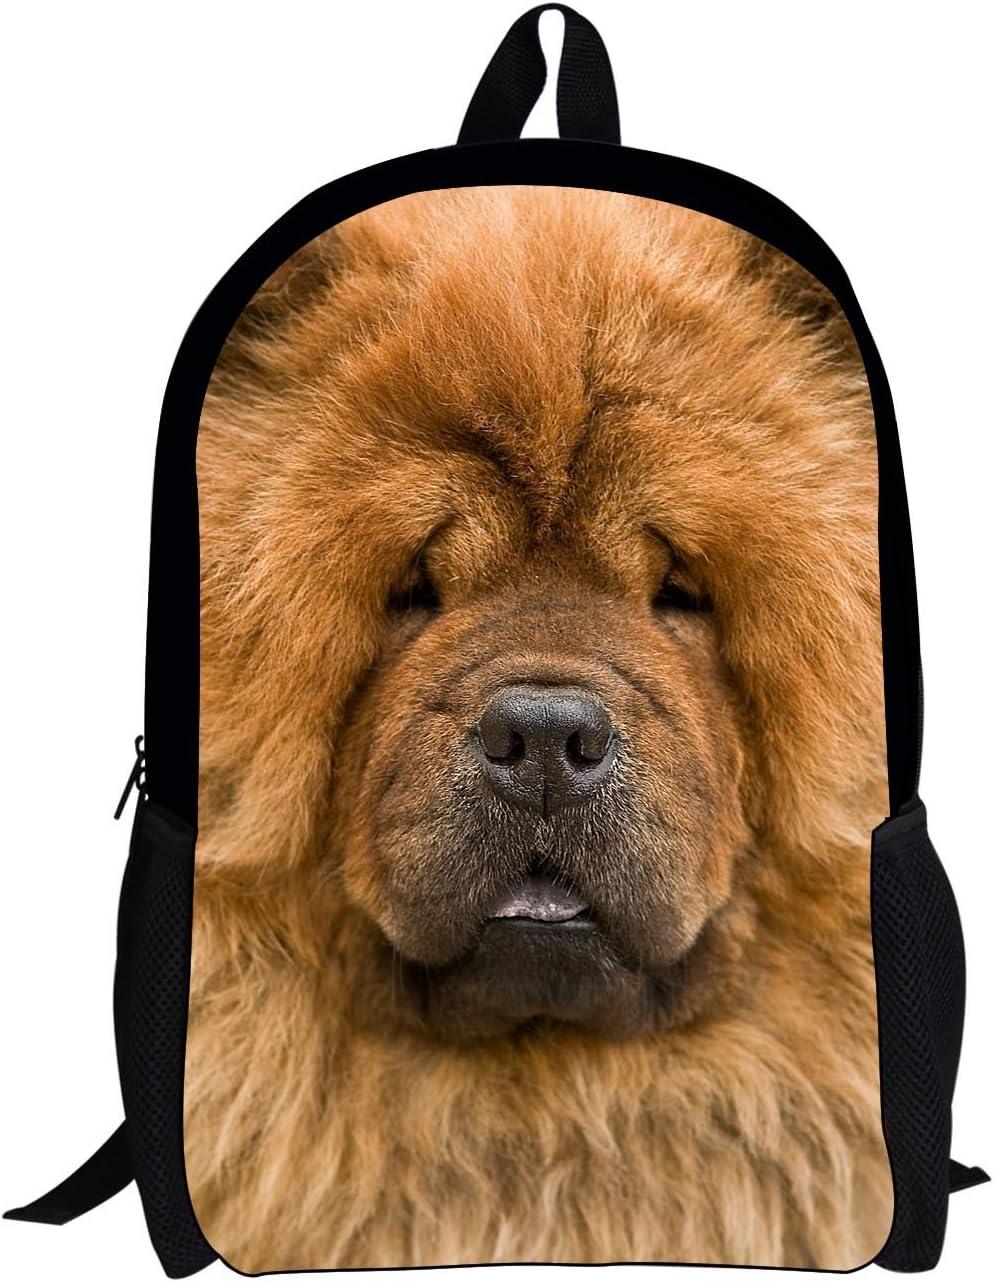 Horeset Backpack Lightweight 3D Cute Dog Print Laptop Bag Shoulder School Bags Daypack Travel Bookbags Laptop Bag for women girls boy men teen 1